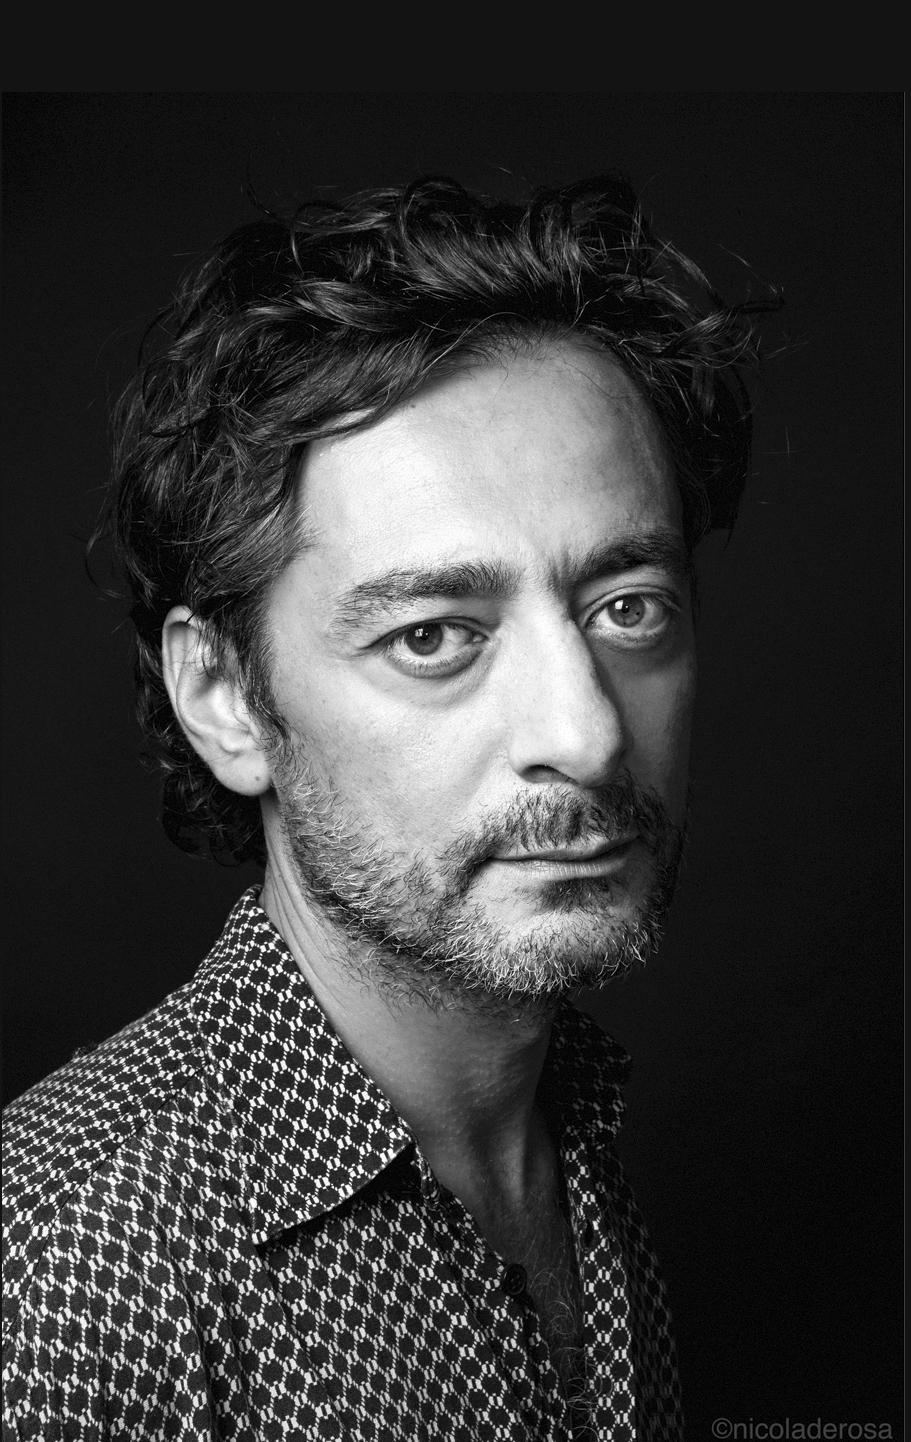 Francesco Guisti (ITA)